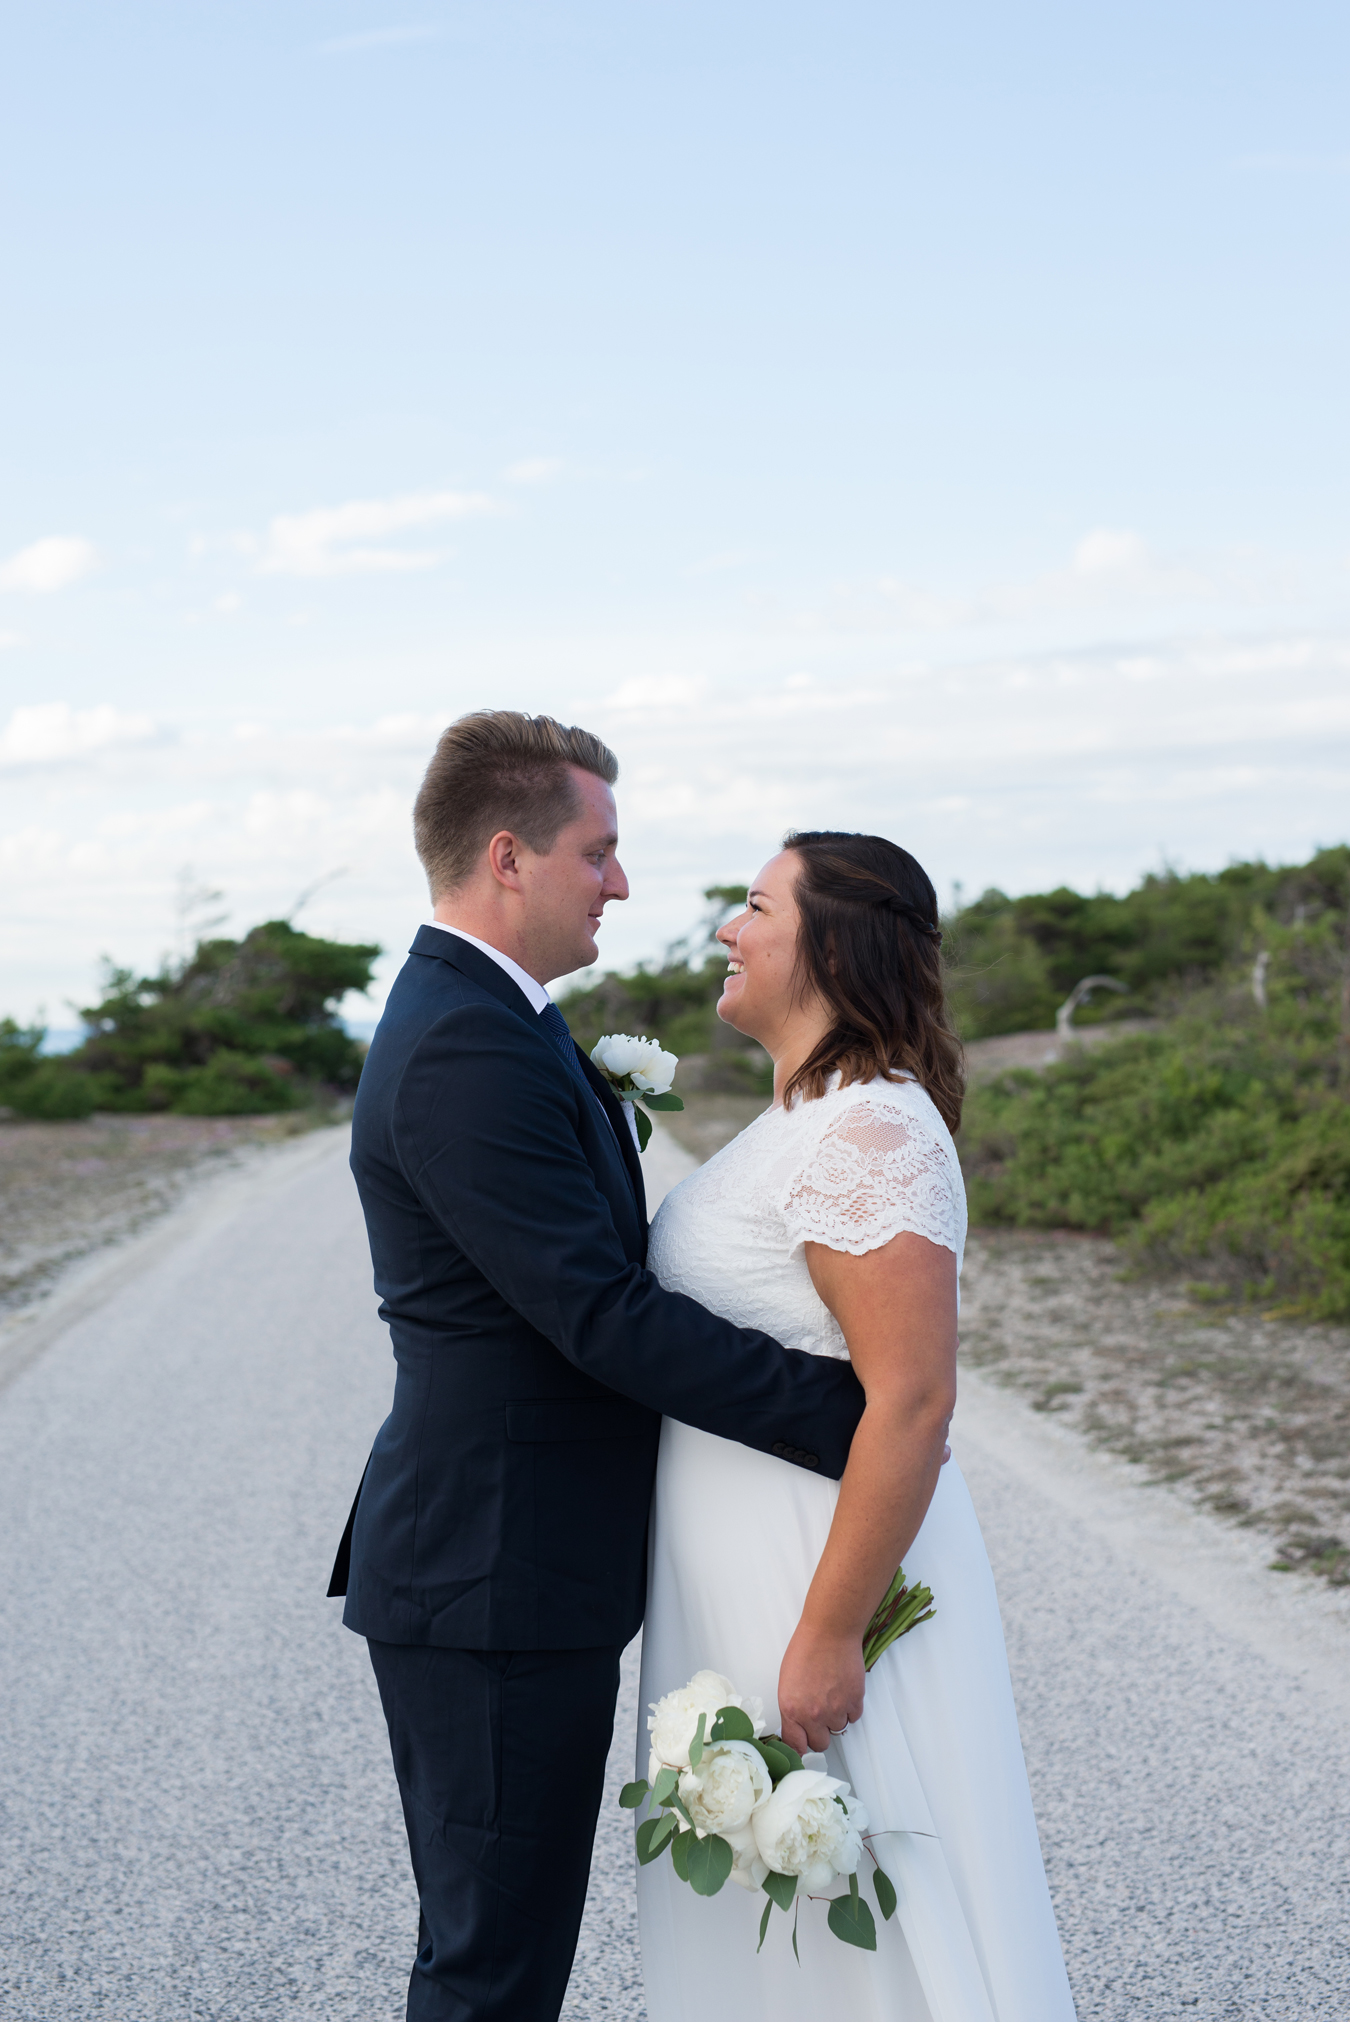 097-bröllopsfotograf-gotland-ekstakusten-neas-fotografi.jpg